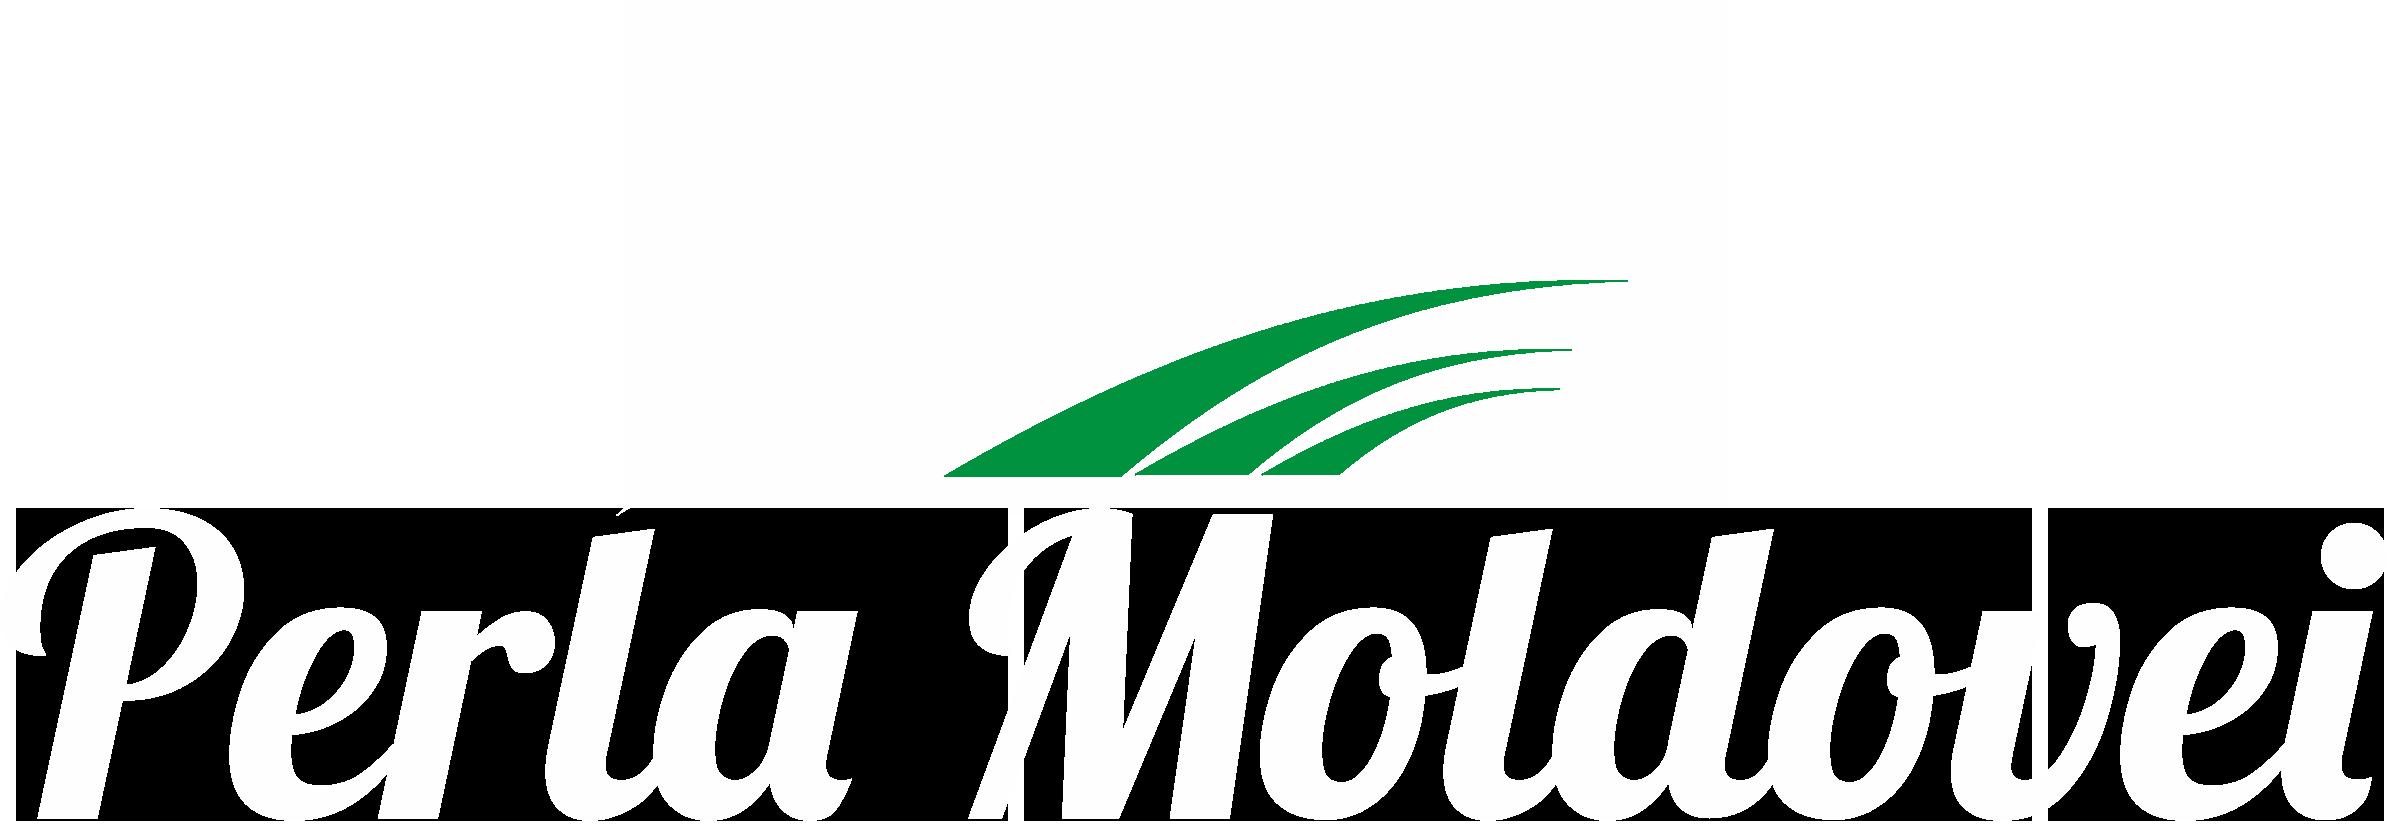 Apa Alcalina Perla Moldovei